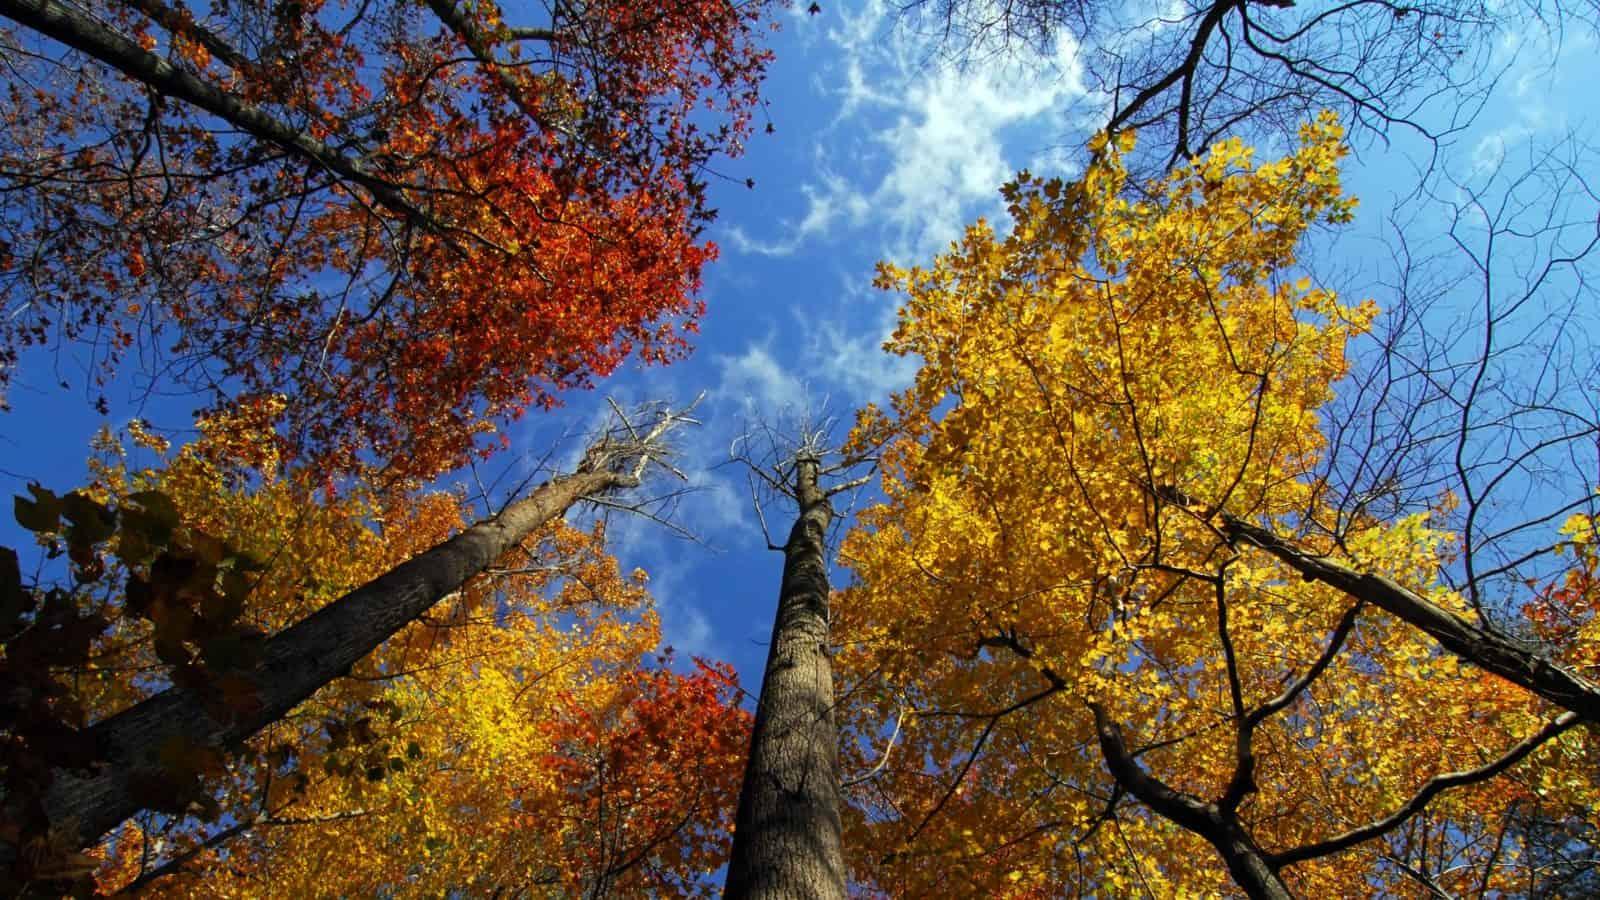 Autumn trees with blue sky